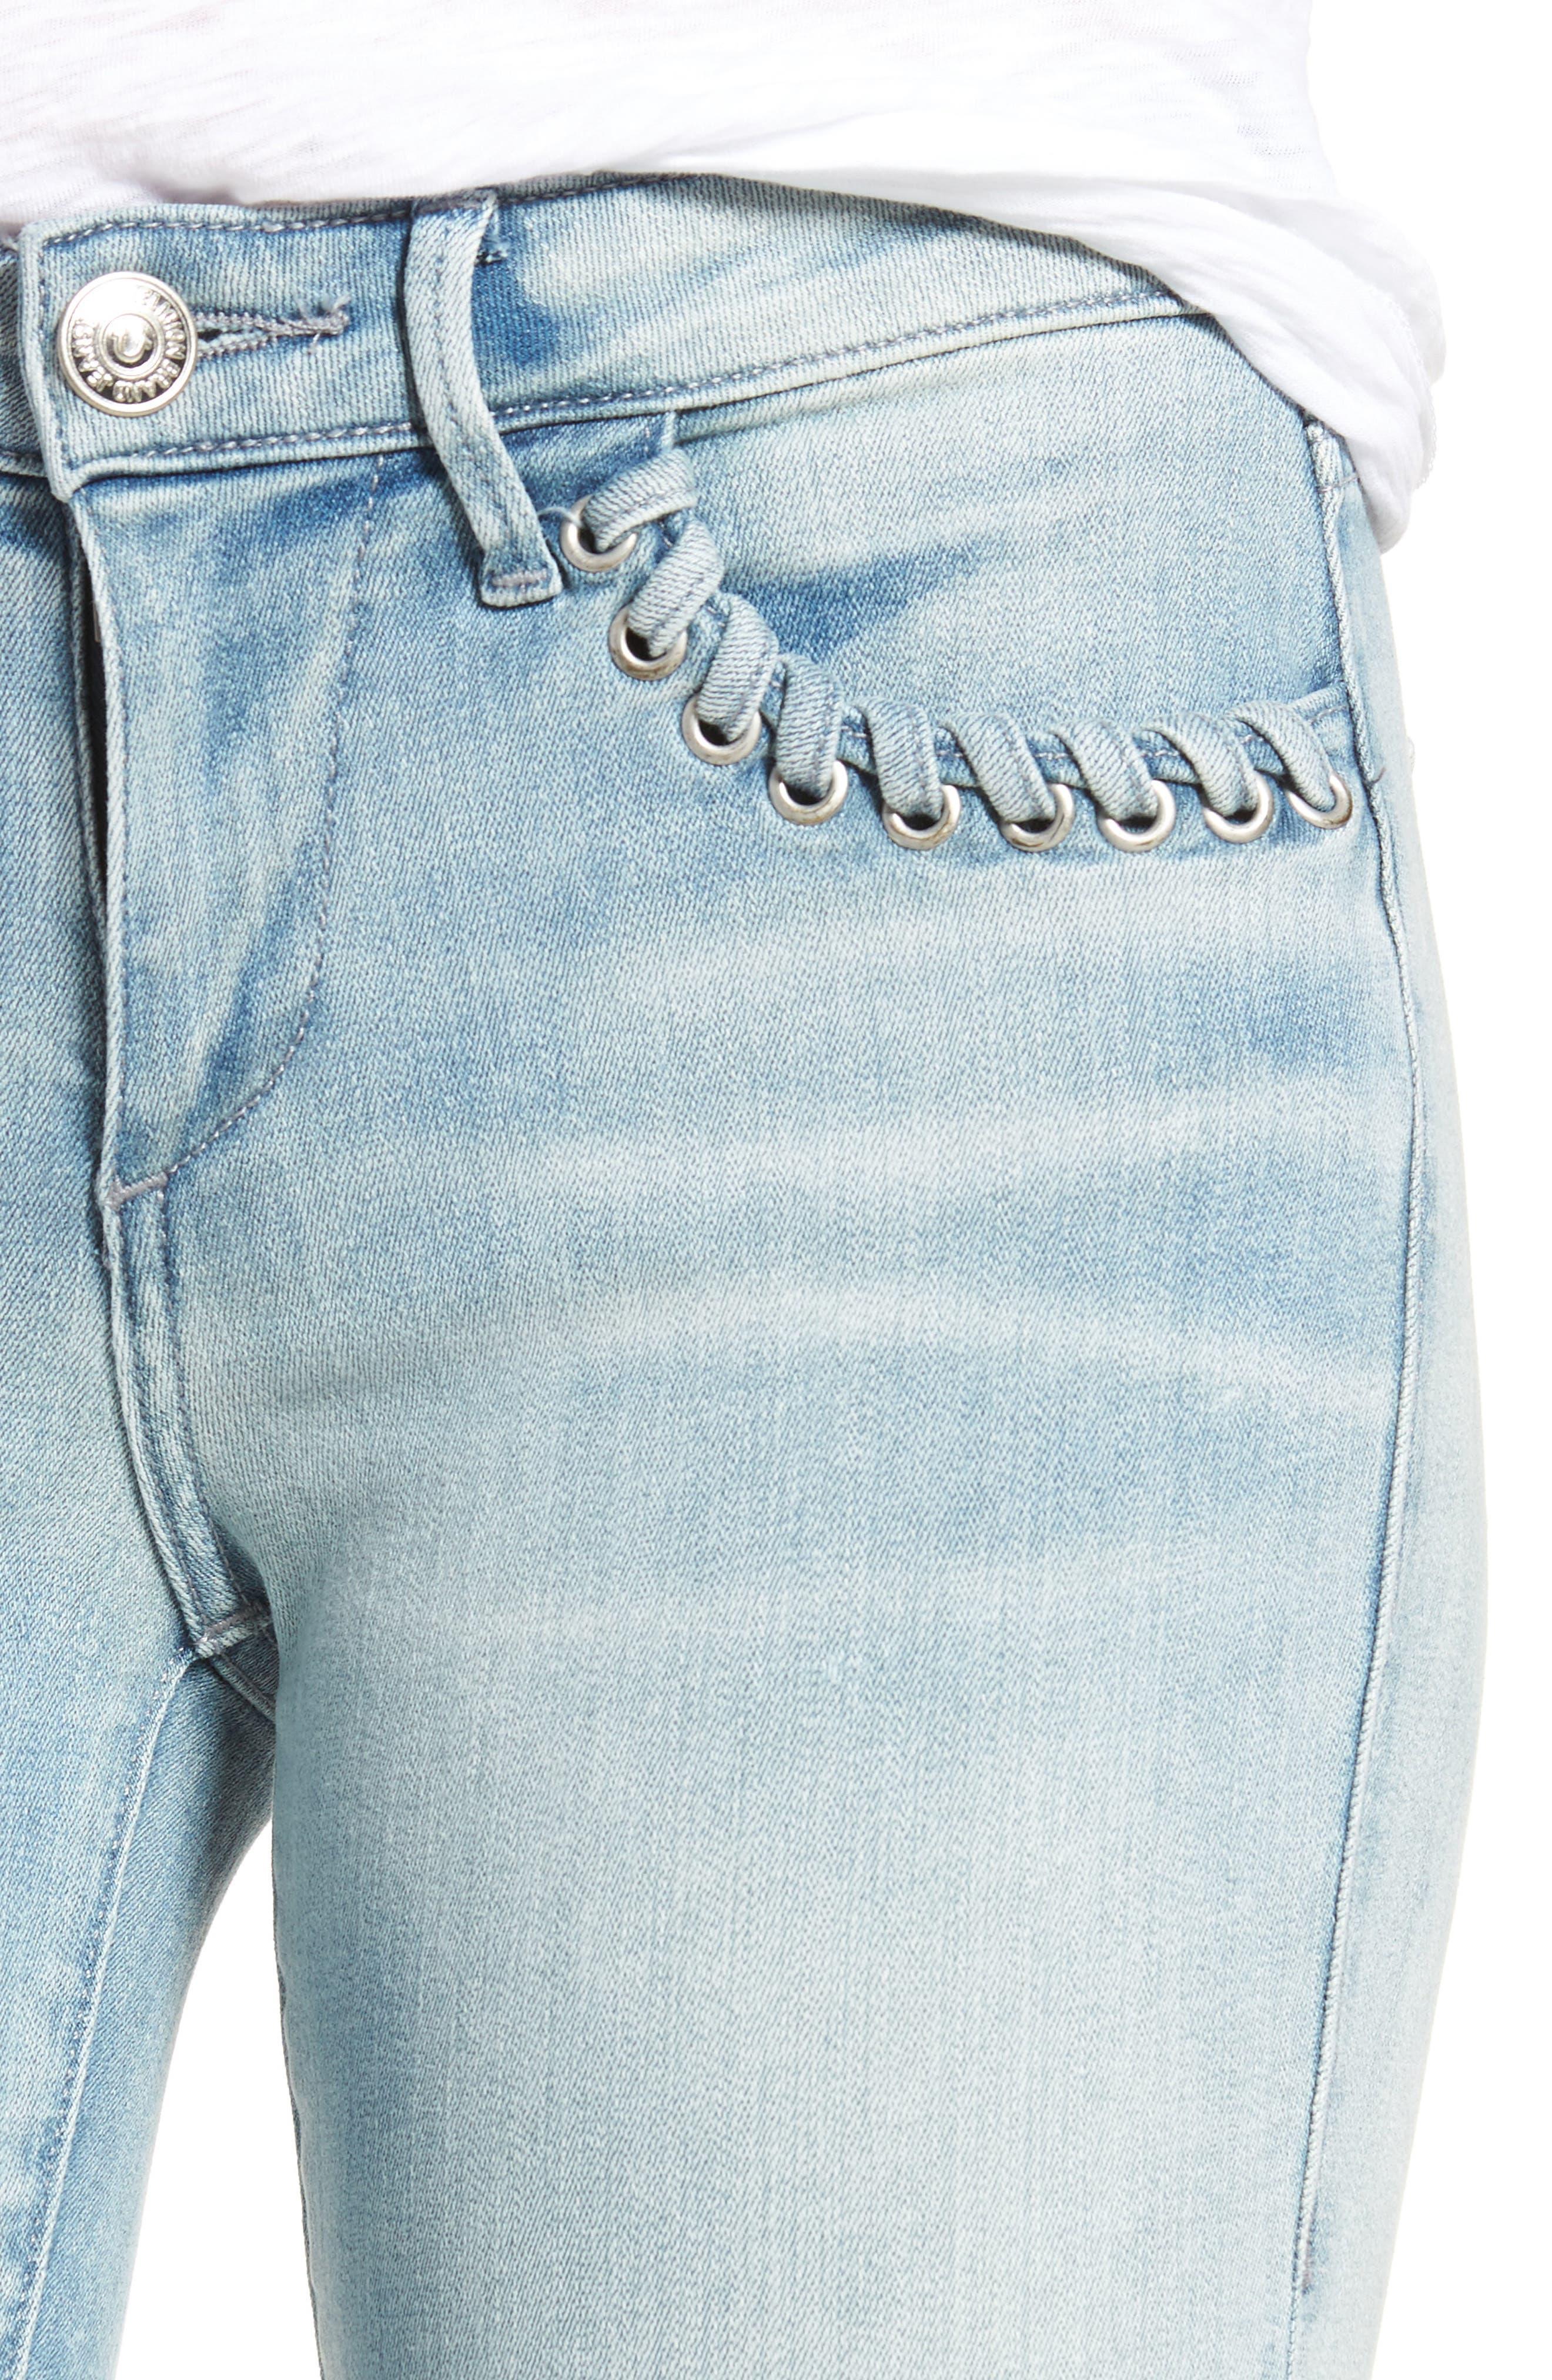 Halle Super Skinny Jeans,                             Alternate thumbnail 5, color,                             401